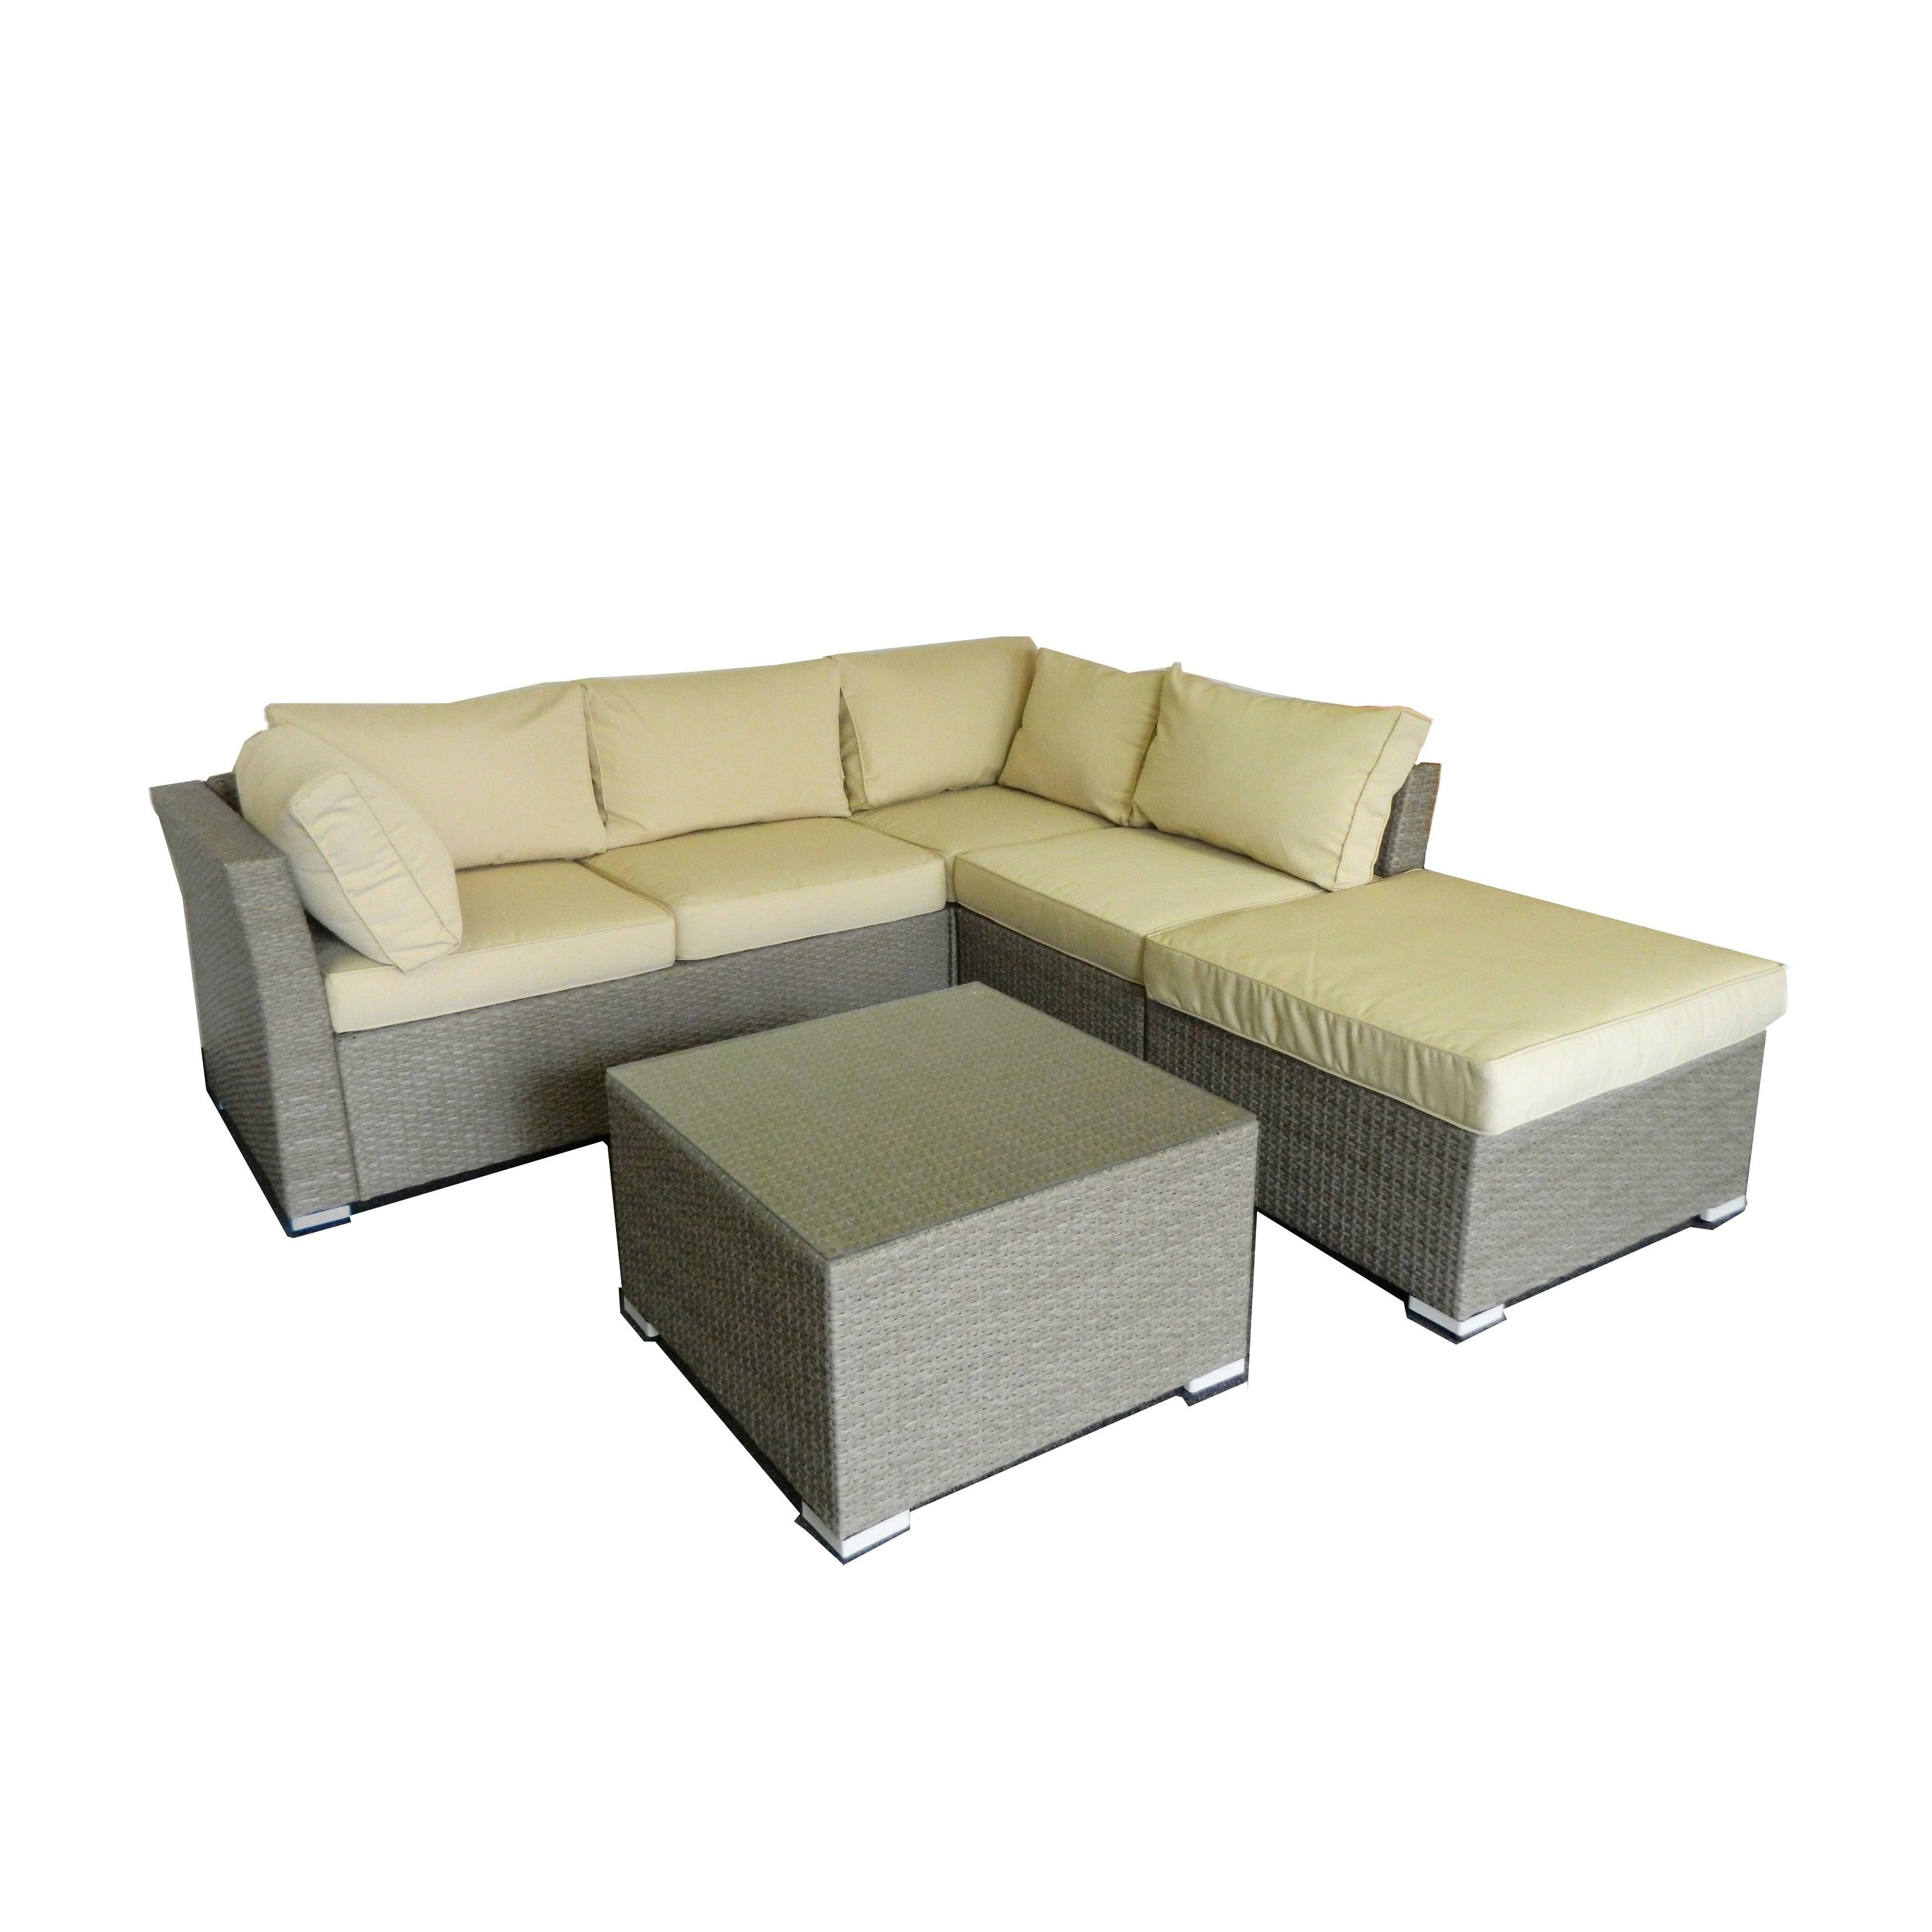 the-Hom Jicaro 5-piece Outdoor Wicker Sectional Sofa Set - Free ...